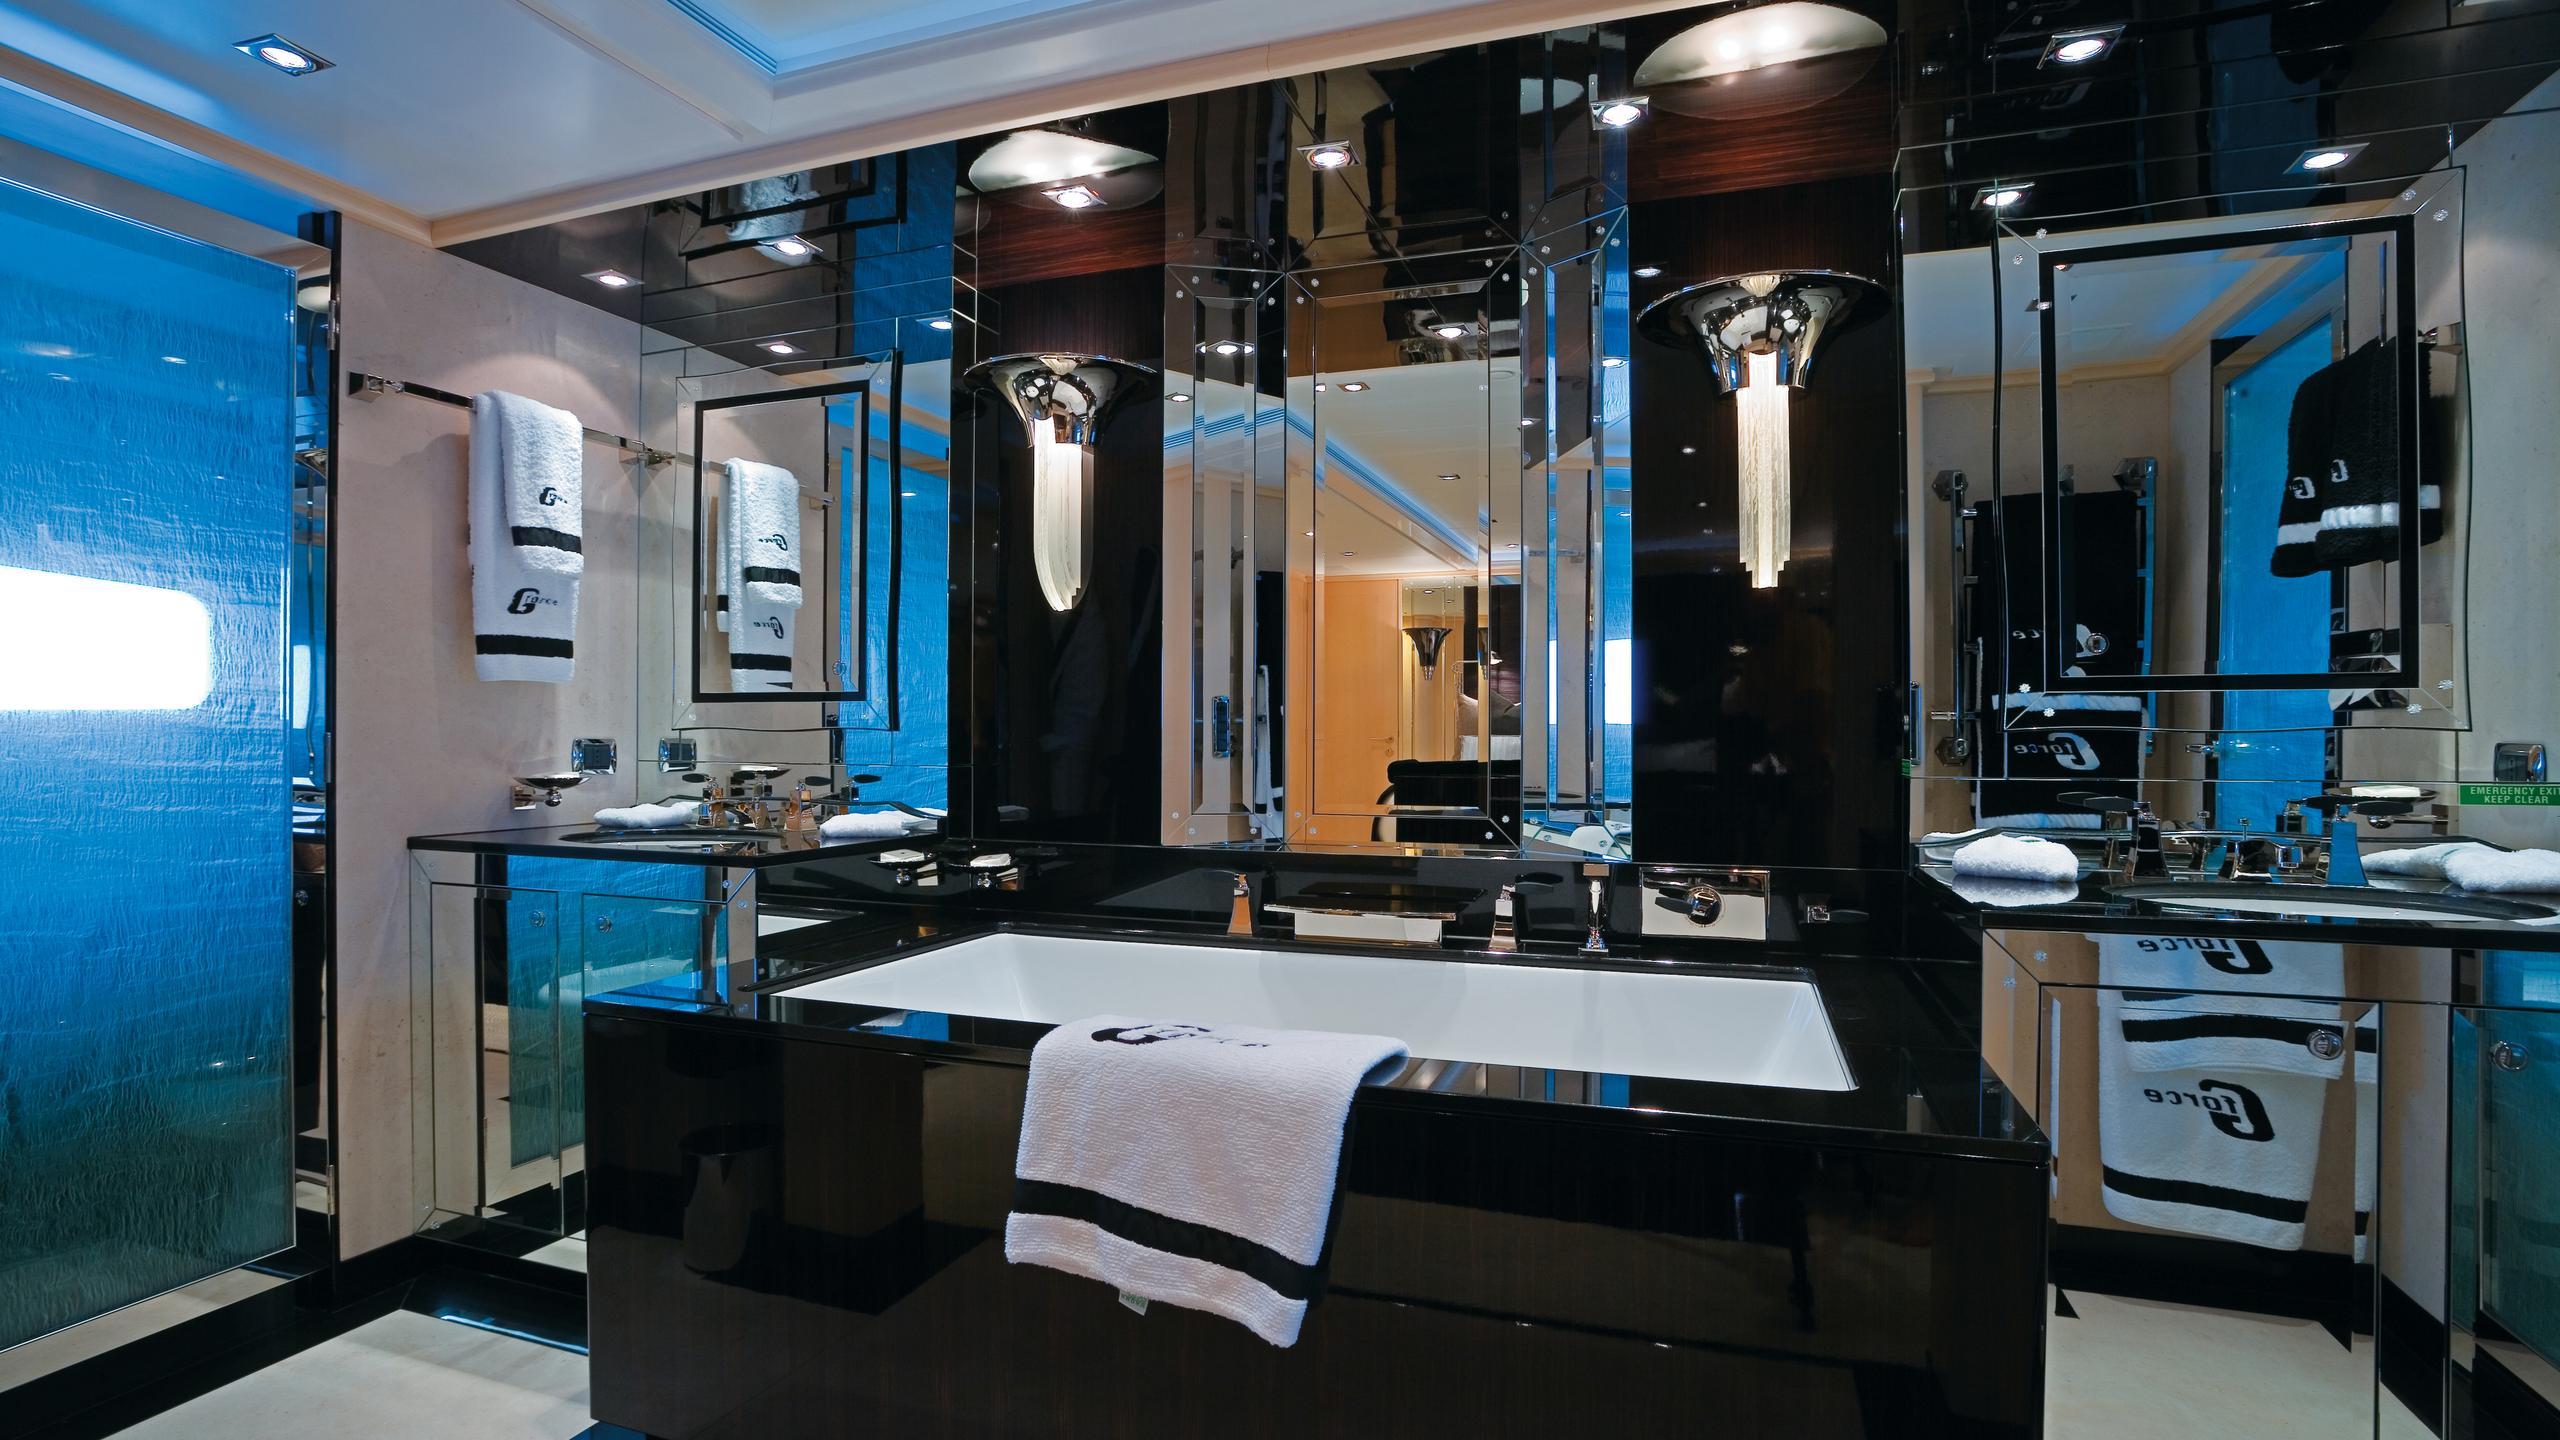 g-force-yacht-bathroom